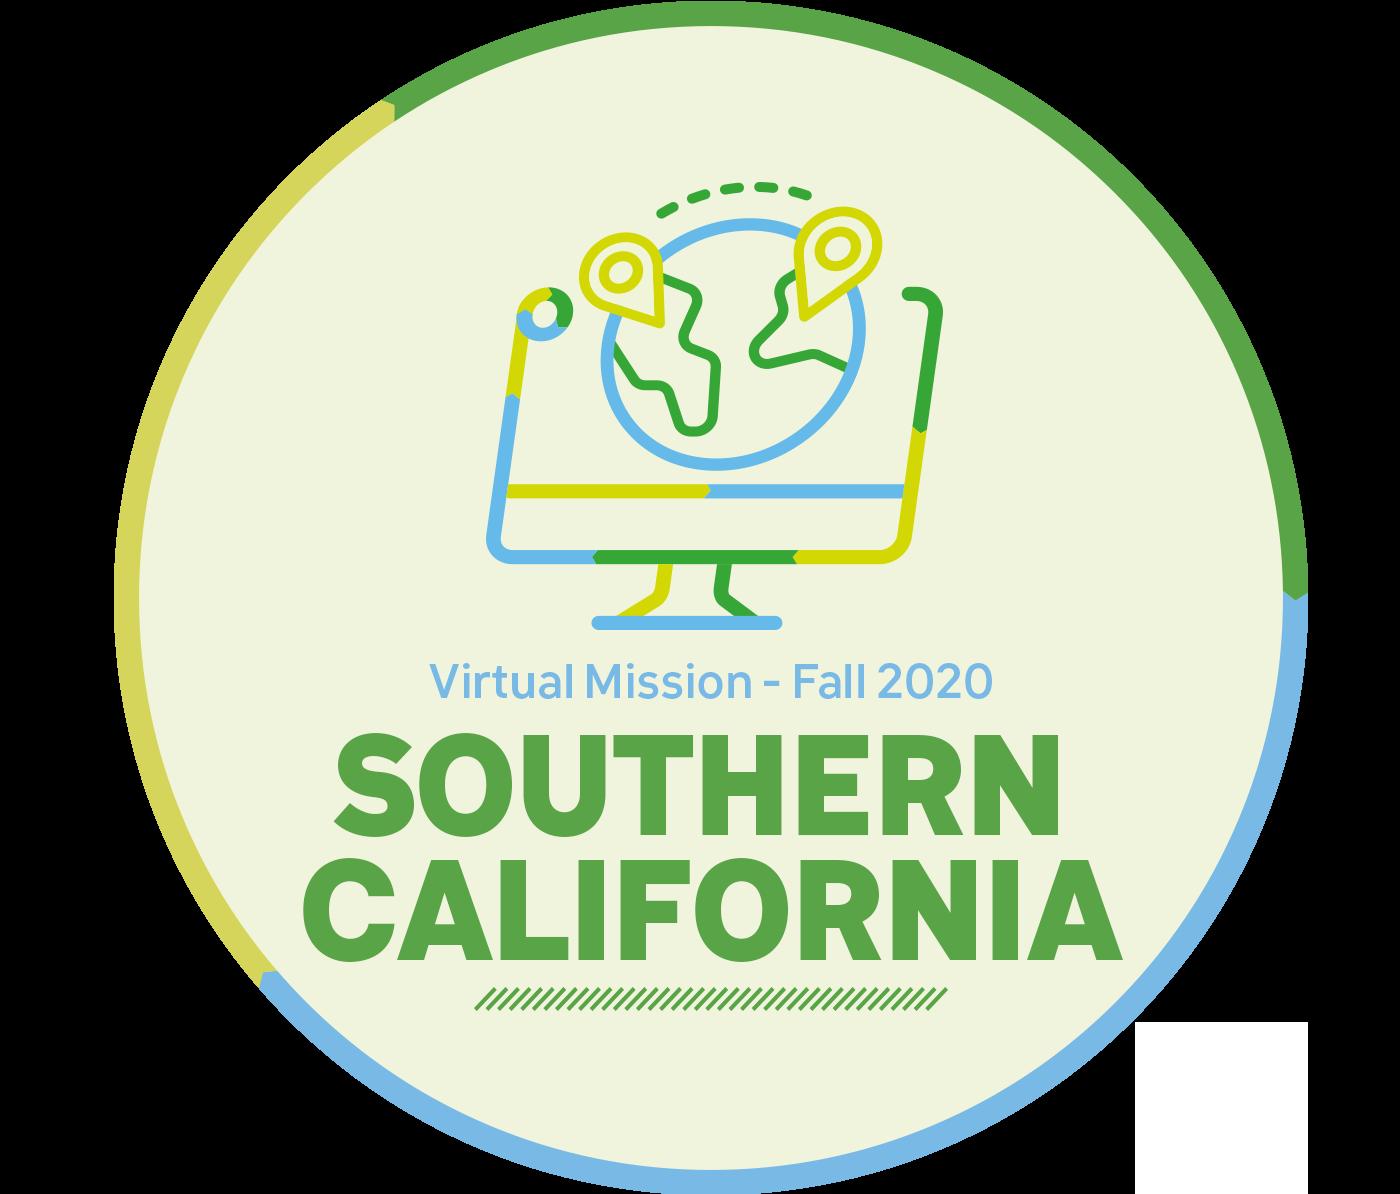 NEW UPCOMING VIRTUAL MISSION - SOUTHERN CALIFORNIA